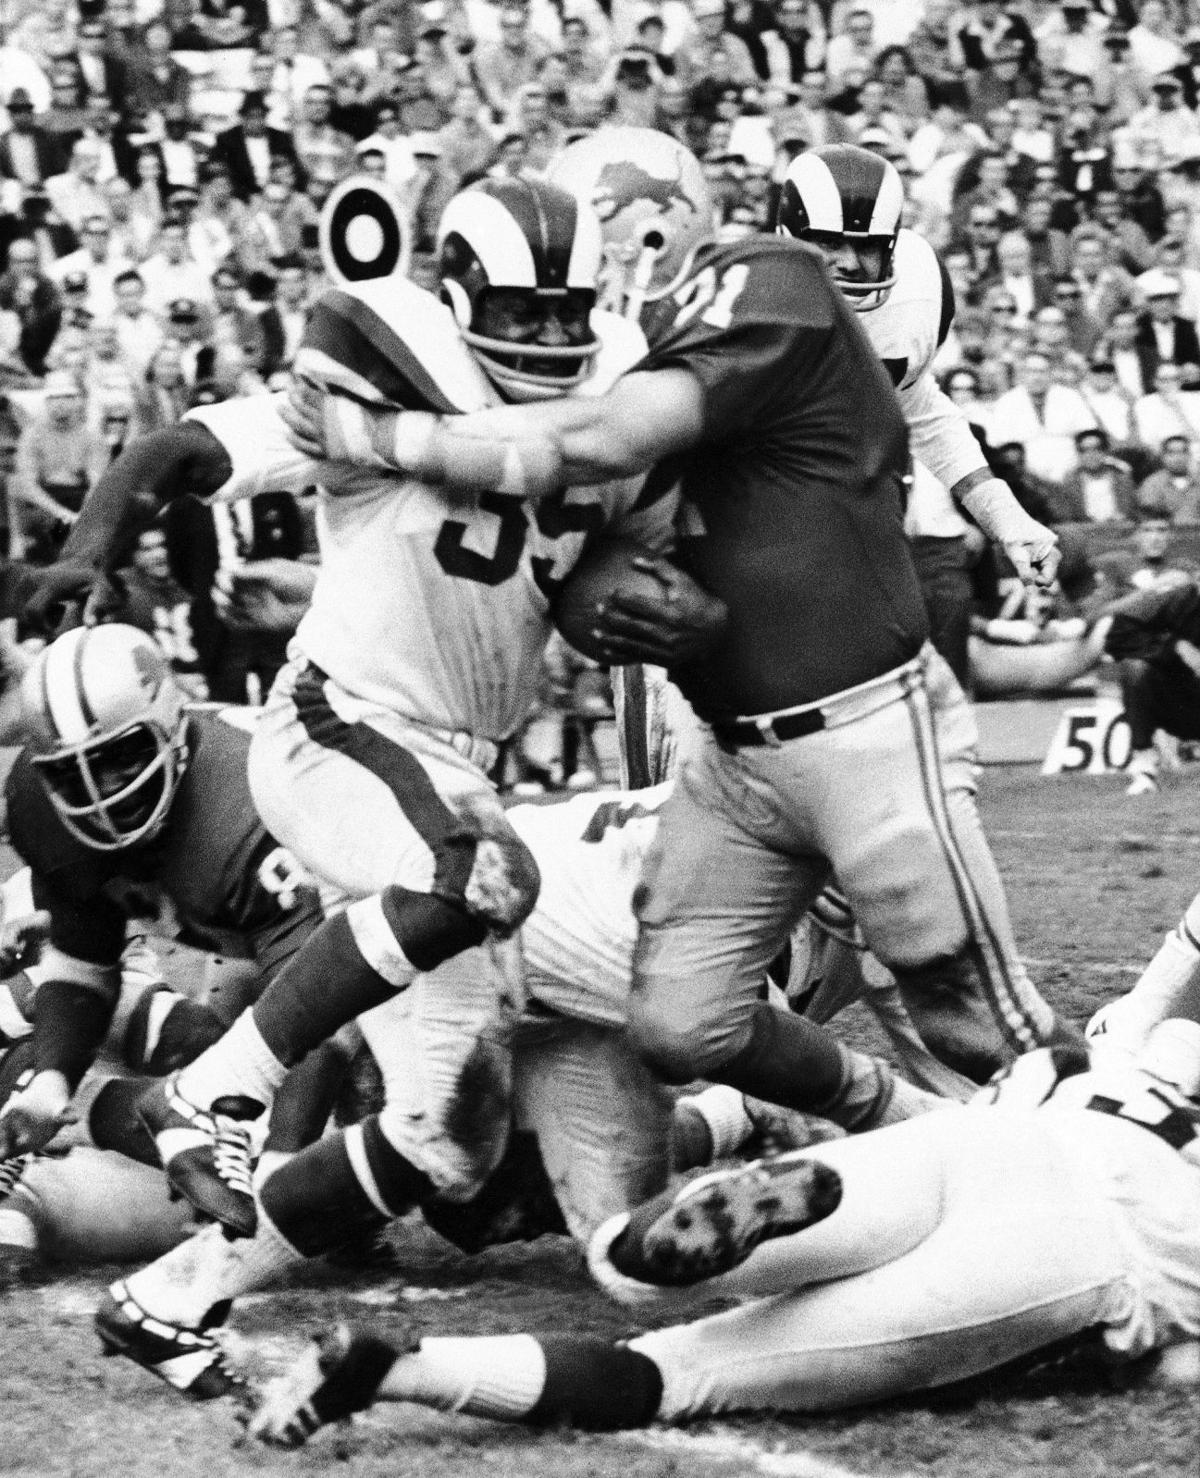 Football Pro NFL Games 1968 Los Angeles vs Detroit